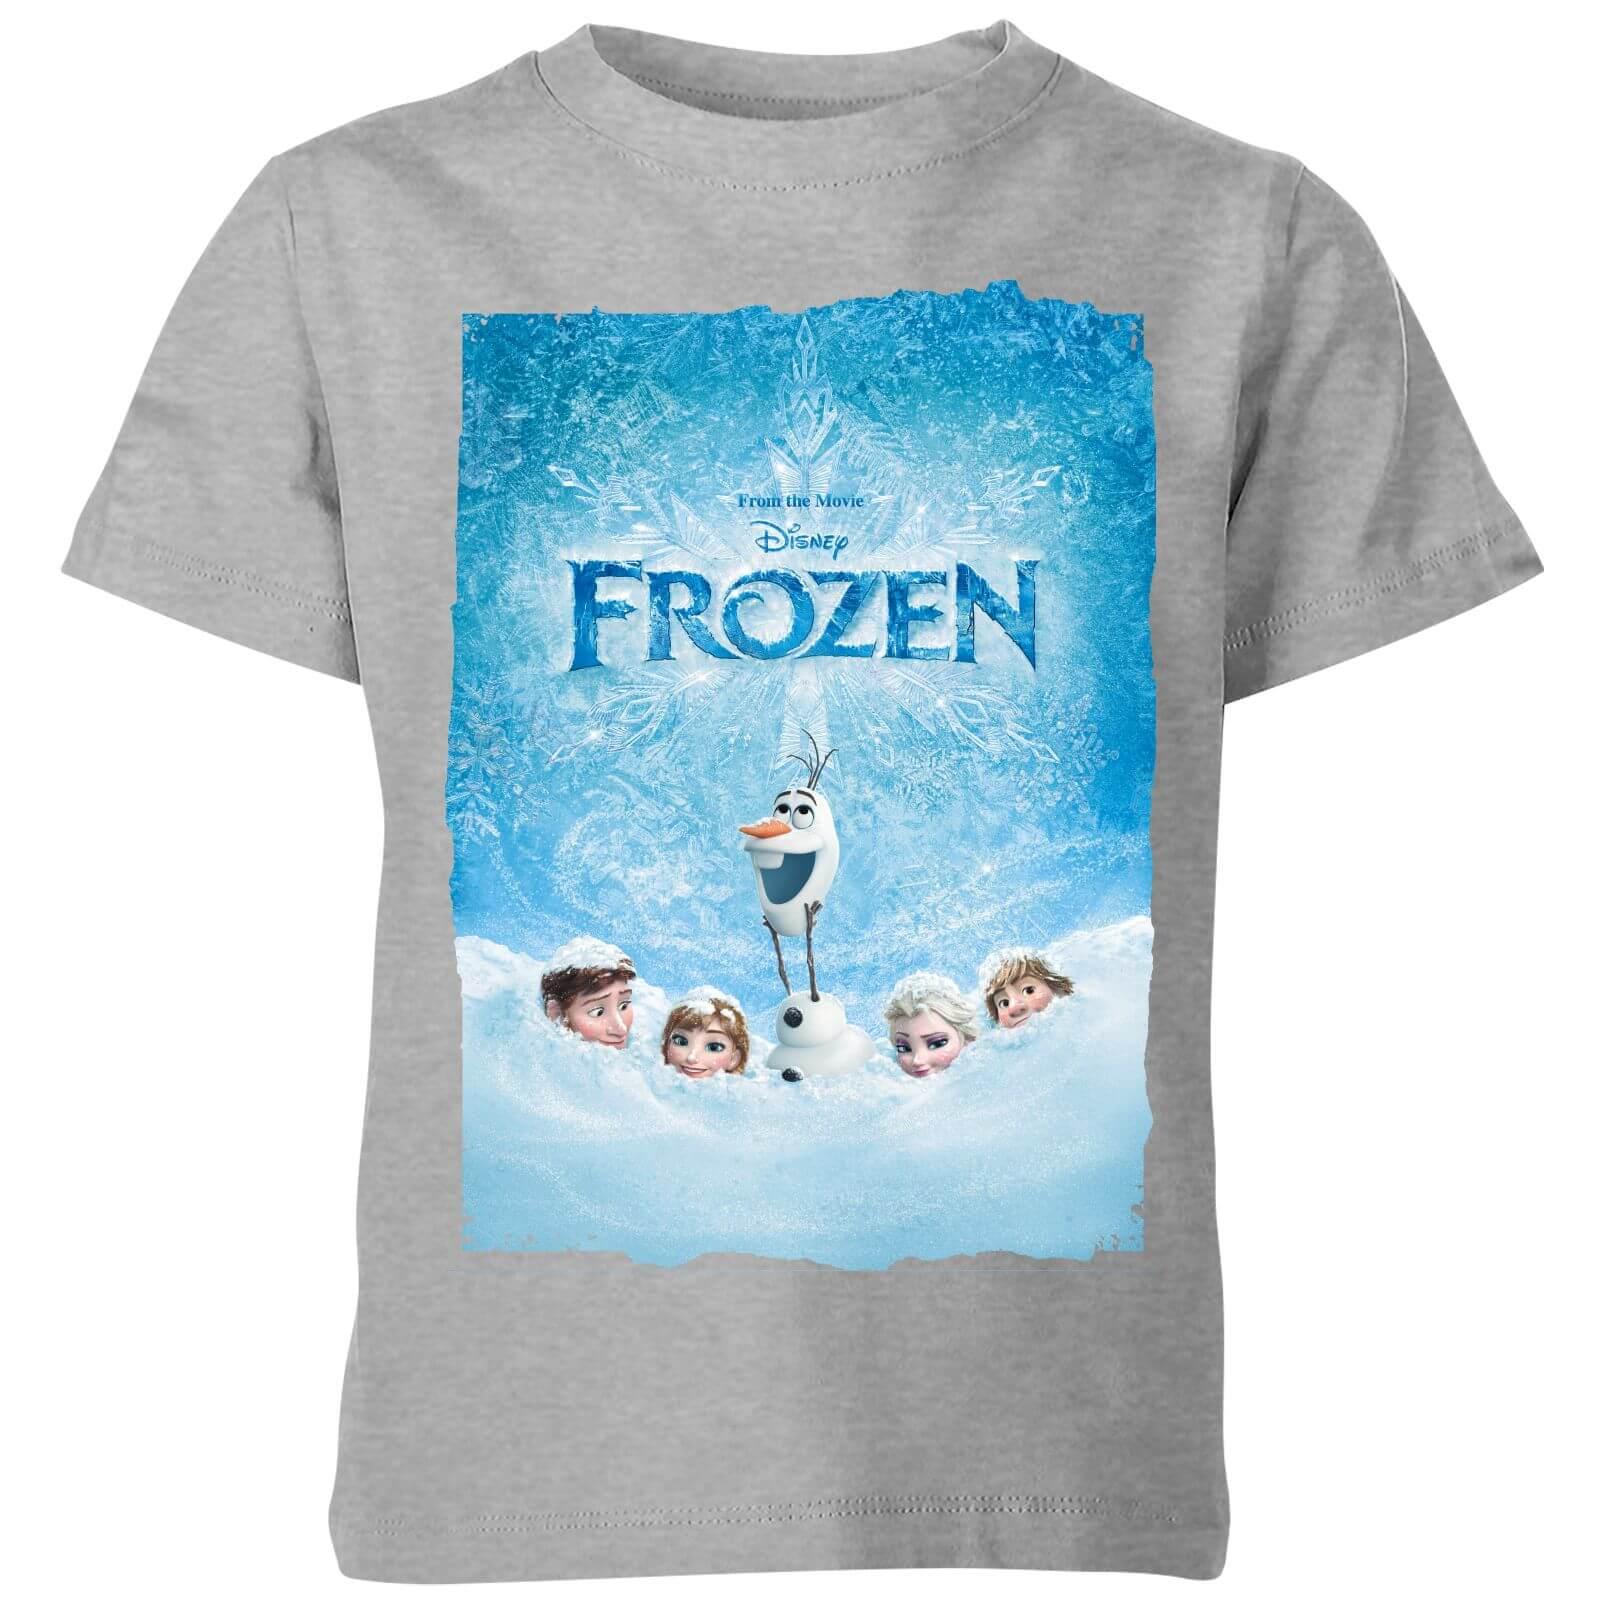 e69b0b2d6 Camiseta Disney Frozen Póster - Niño - Gris Clothing